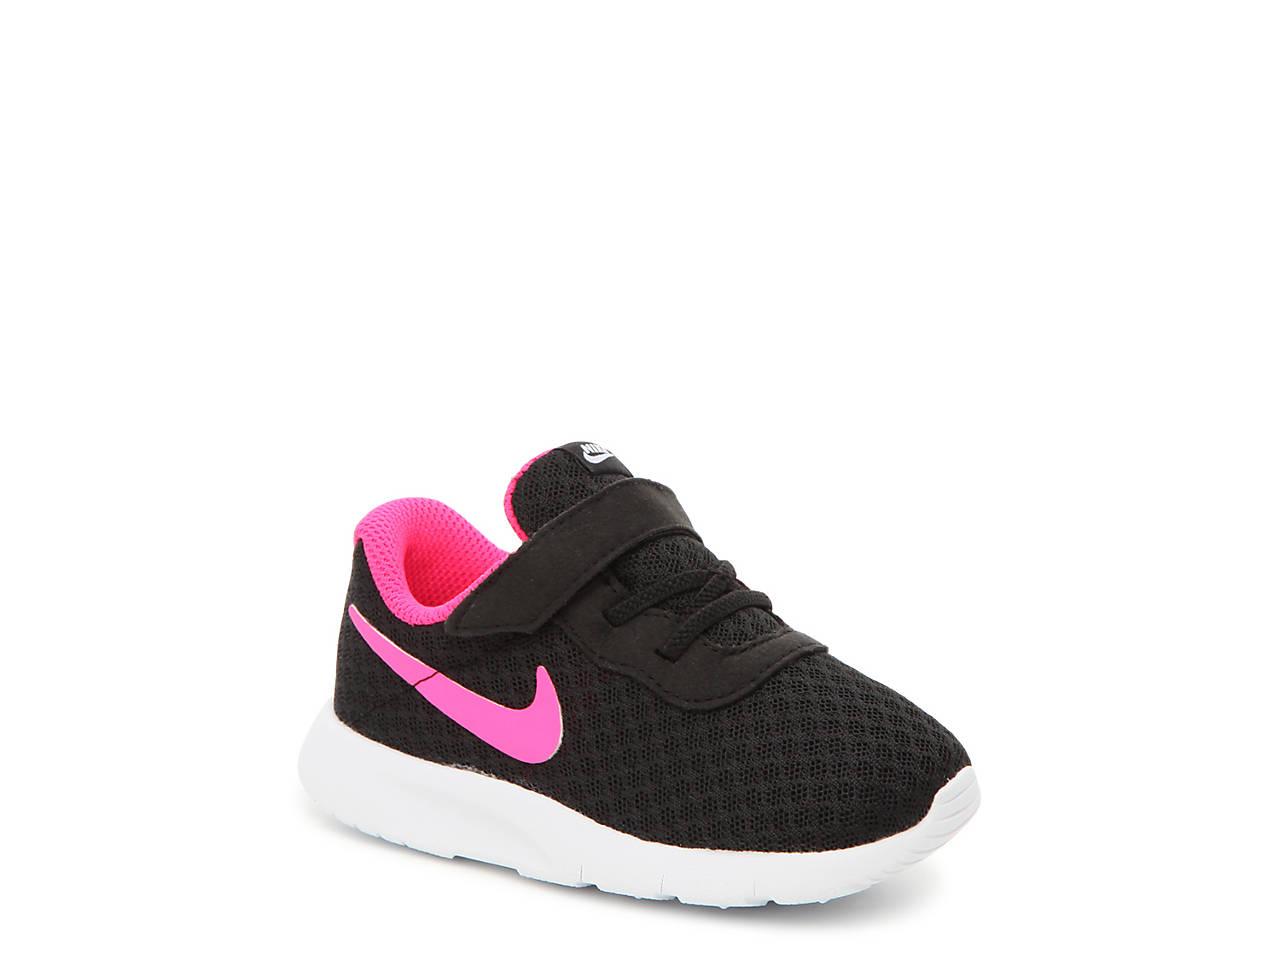 nike shoes tanjun